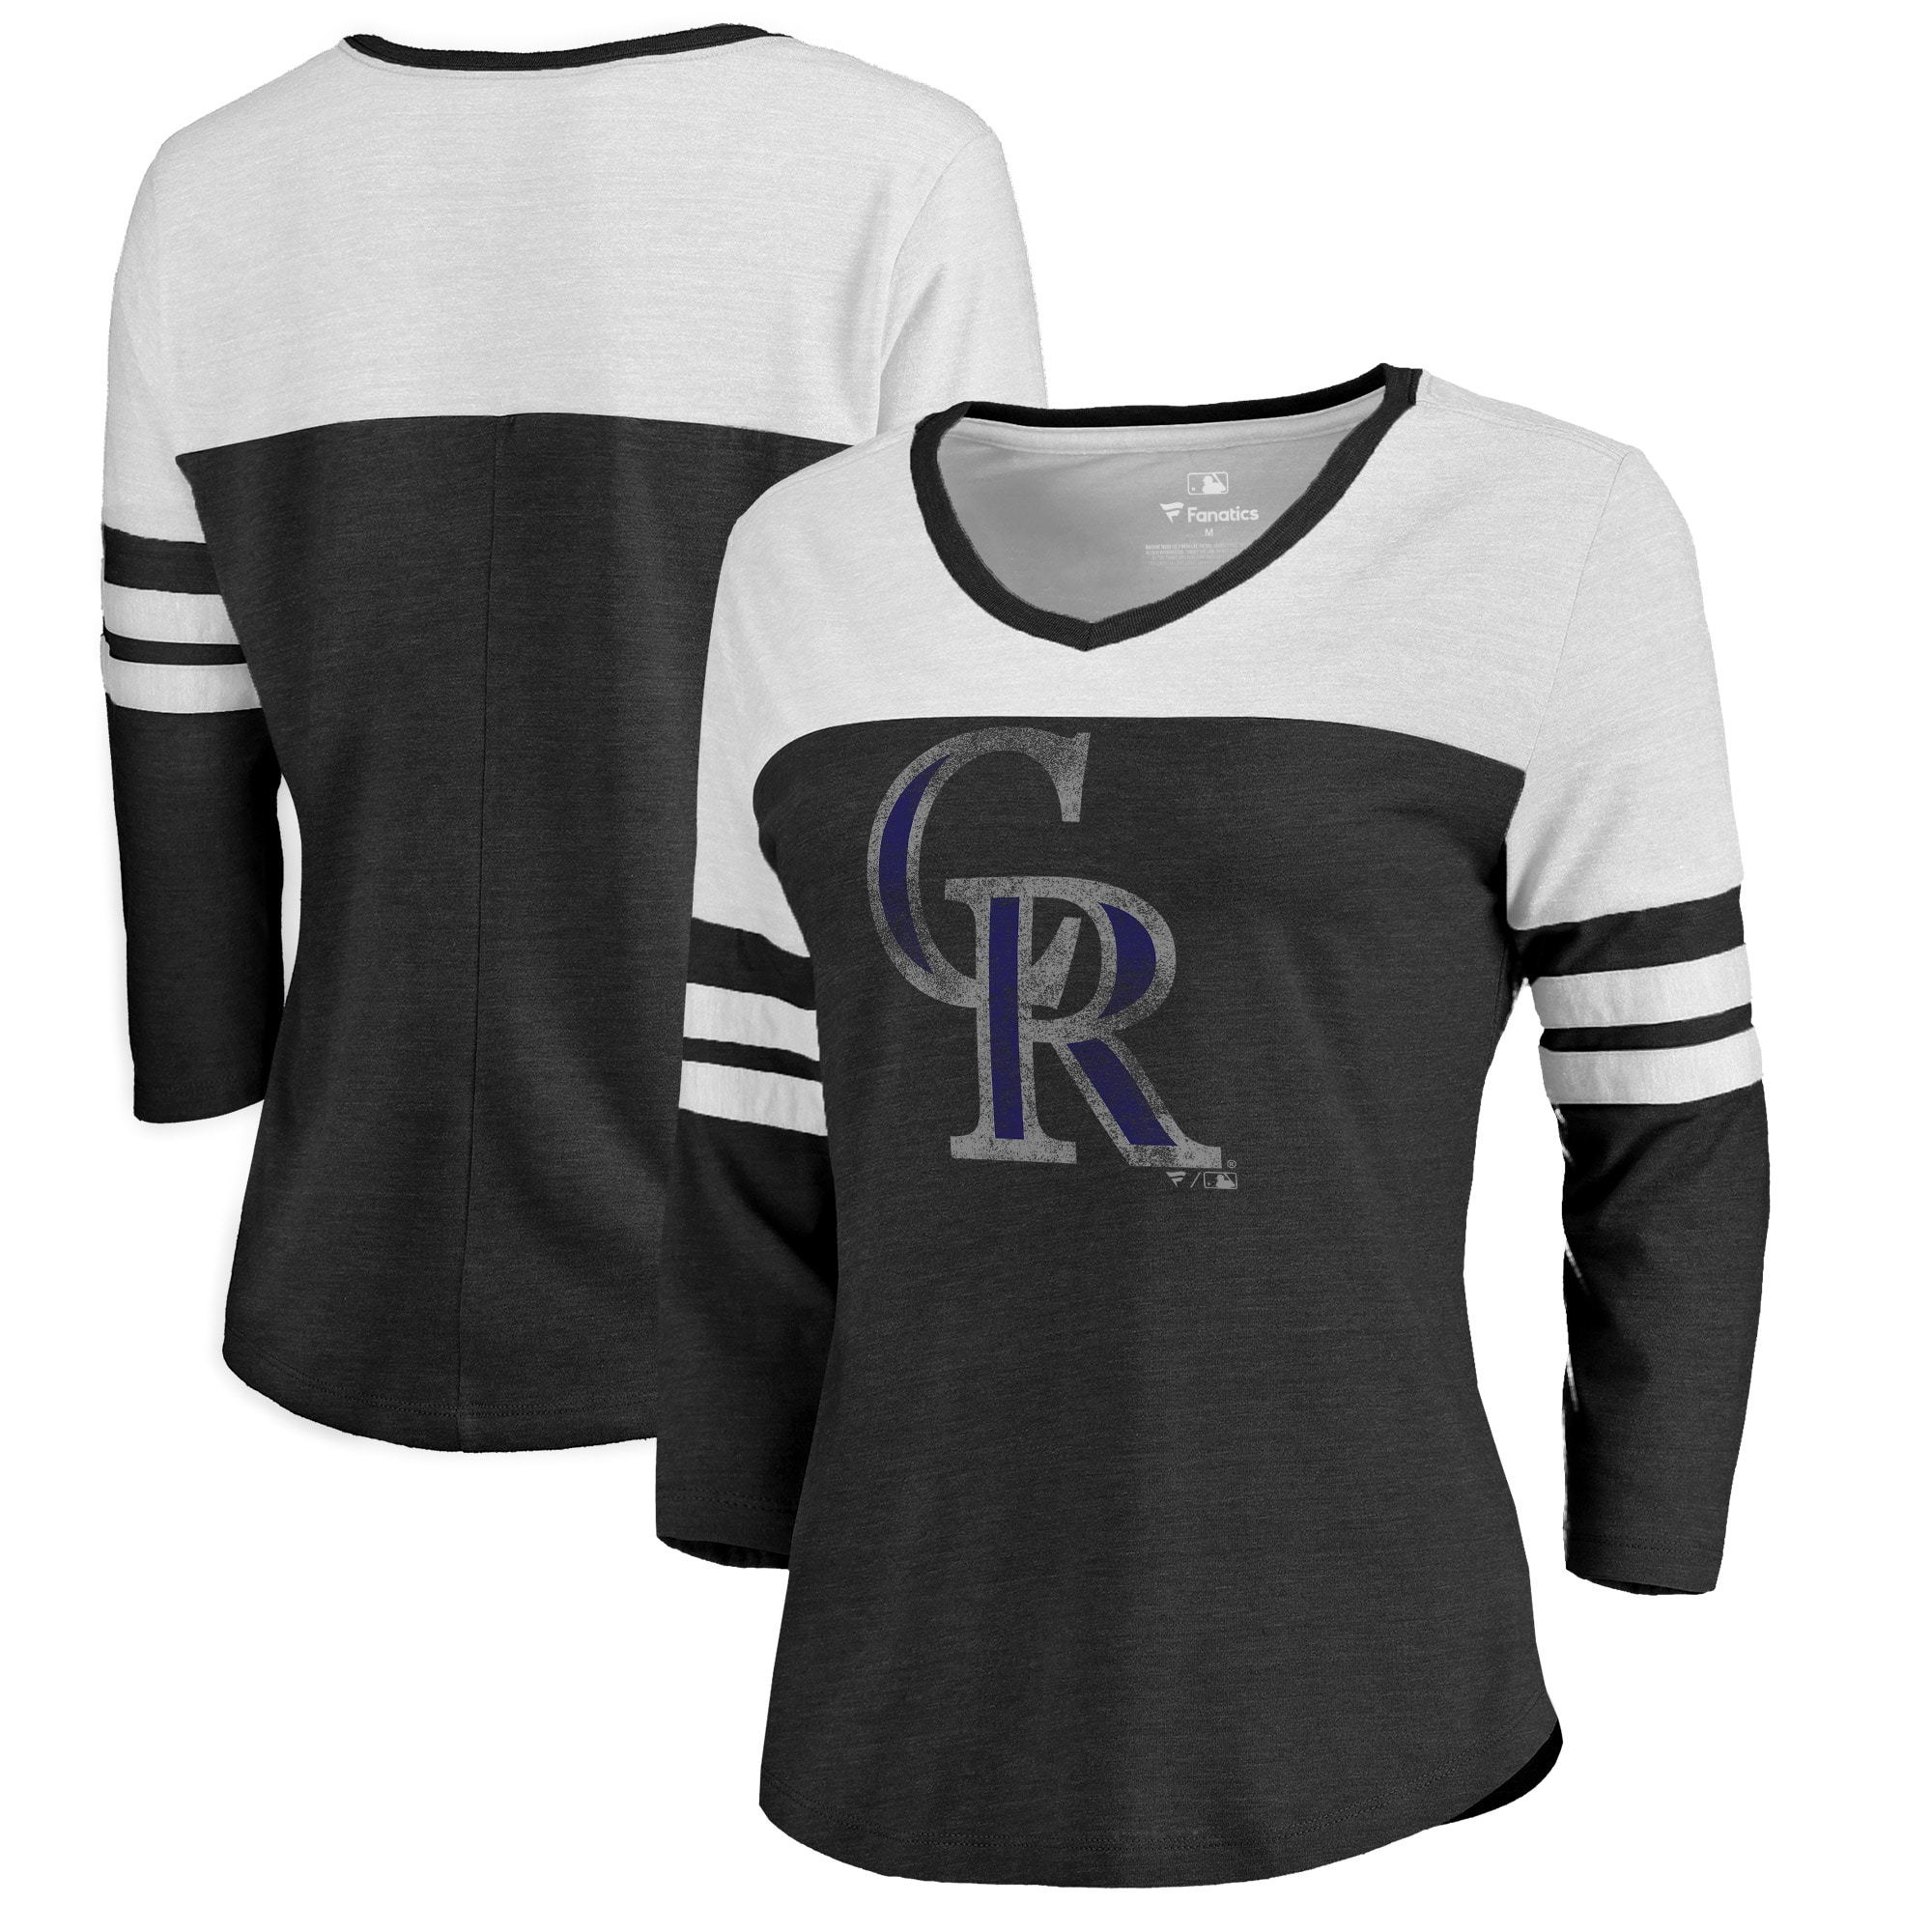 Colorado Rockies Fanatics Branded Women's Distressed Team Logo 3/4 Sleeve Tri-Blend T-Shirt - Black/White